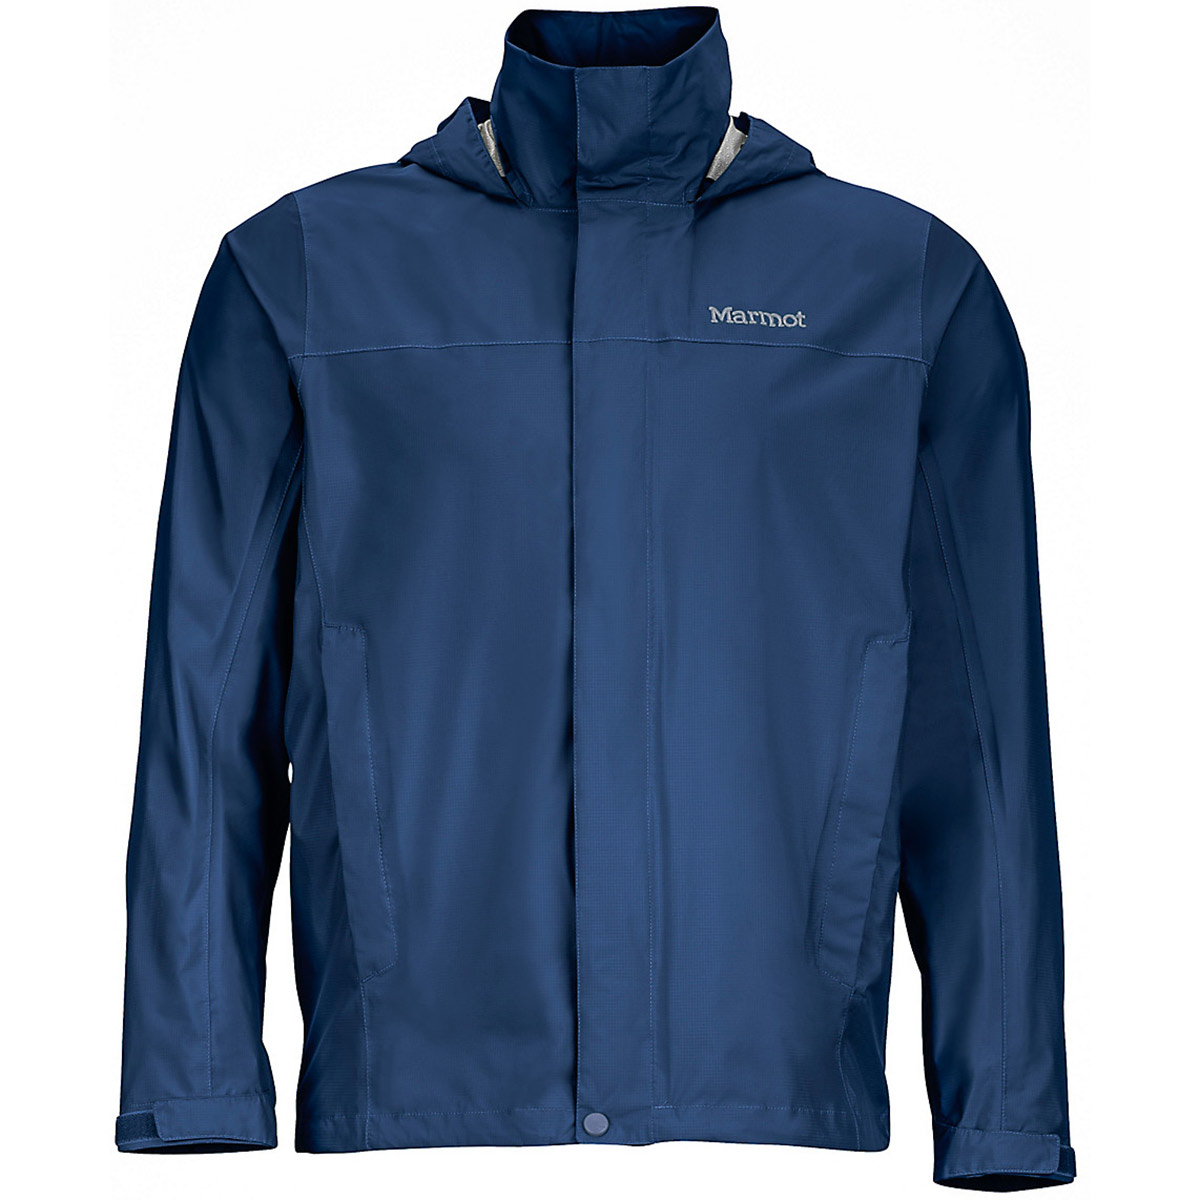 Marmot Men's Precip Jacket - Blue, S